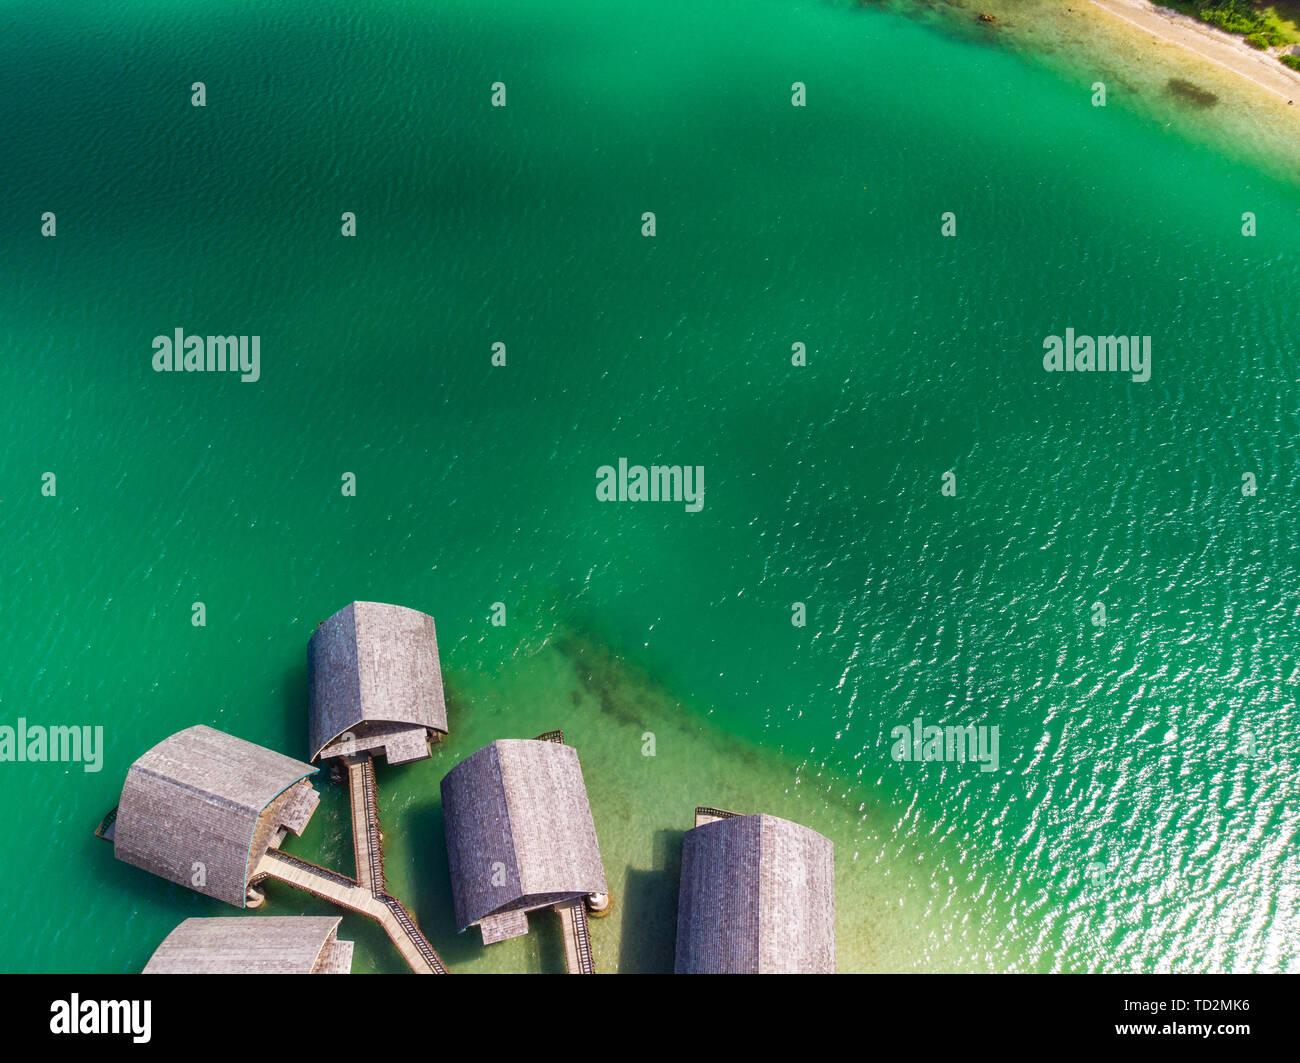 Tropical holidays, Efate, Port Vila, Vanuatu, drone view - Stock Image